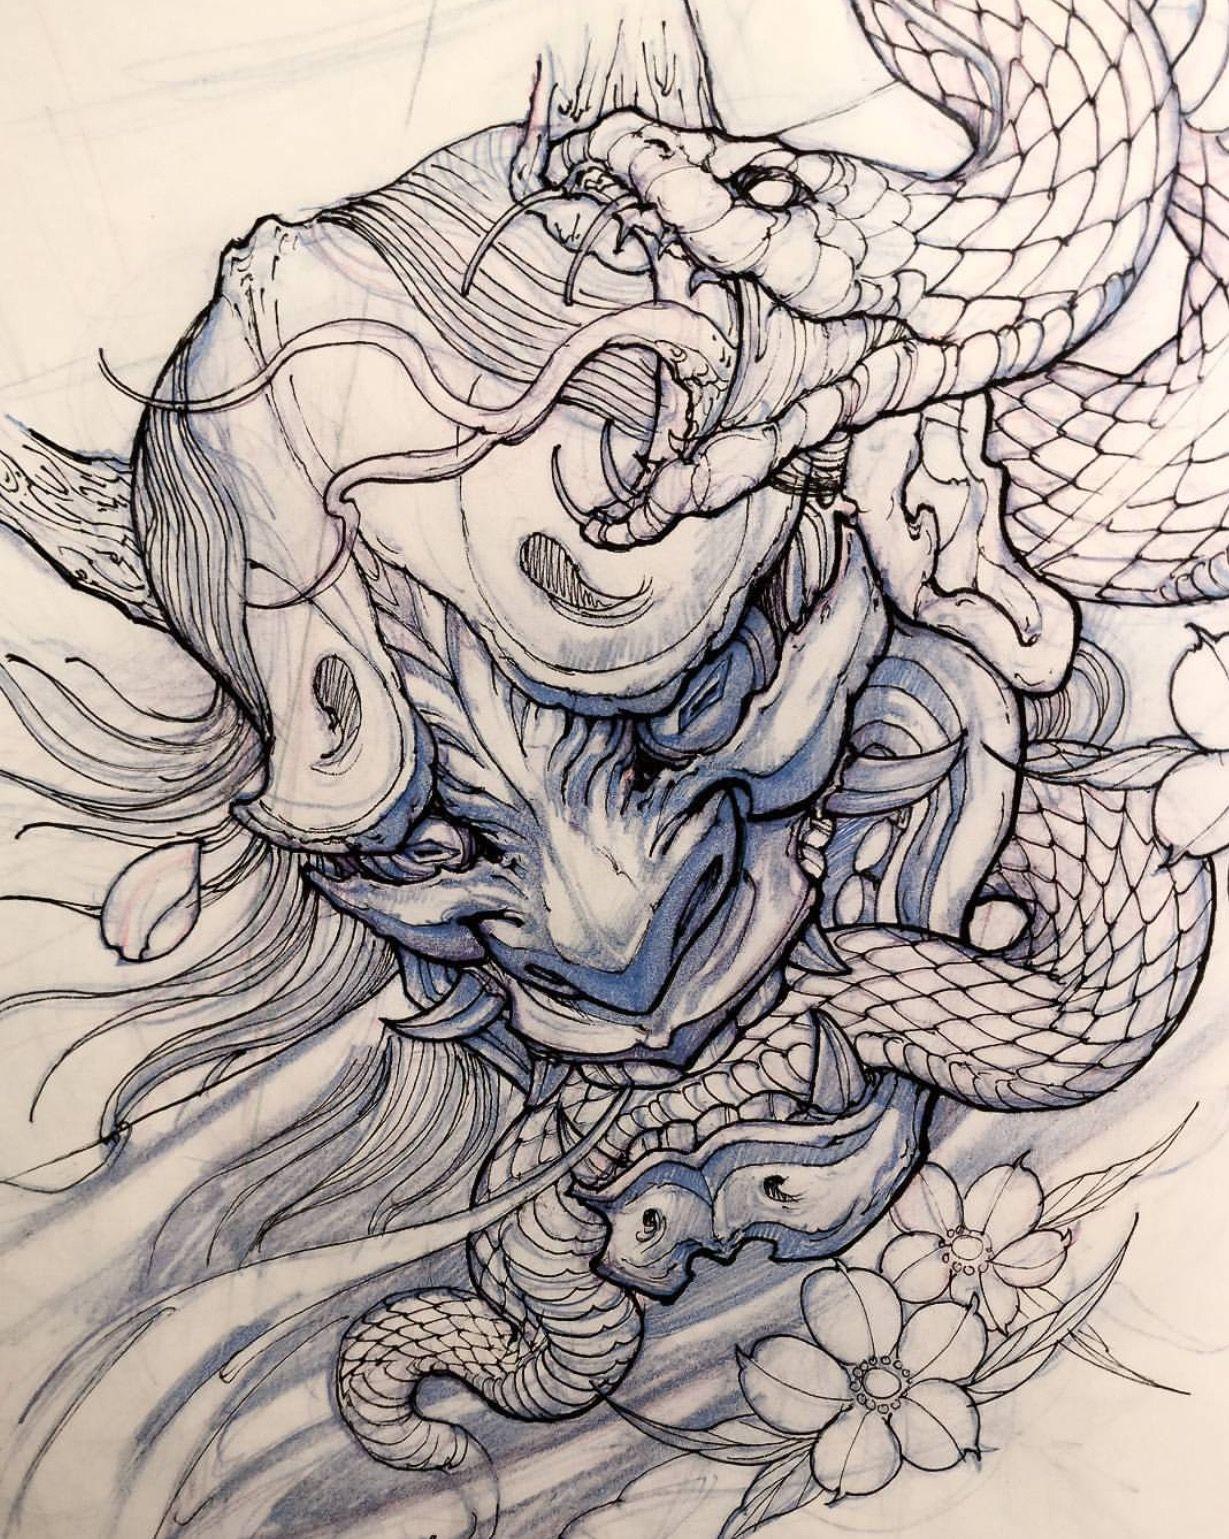 Pin de Devin em HANYA Tatuagem japonesa, Arte da